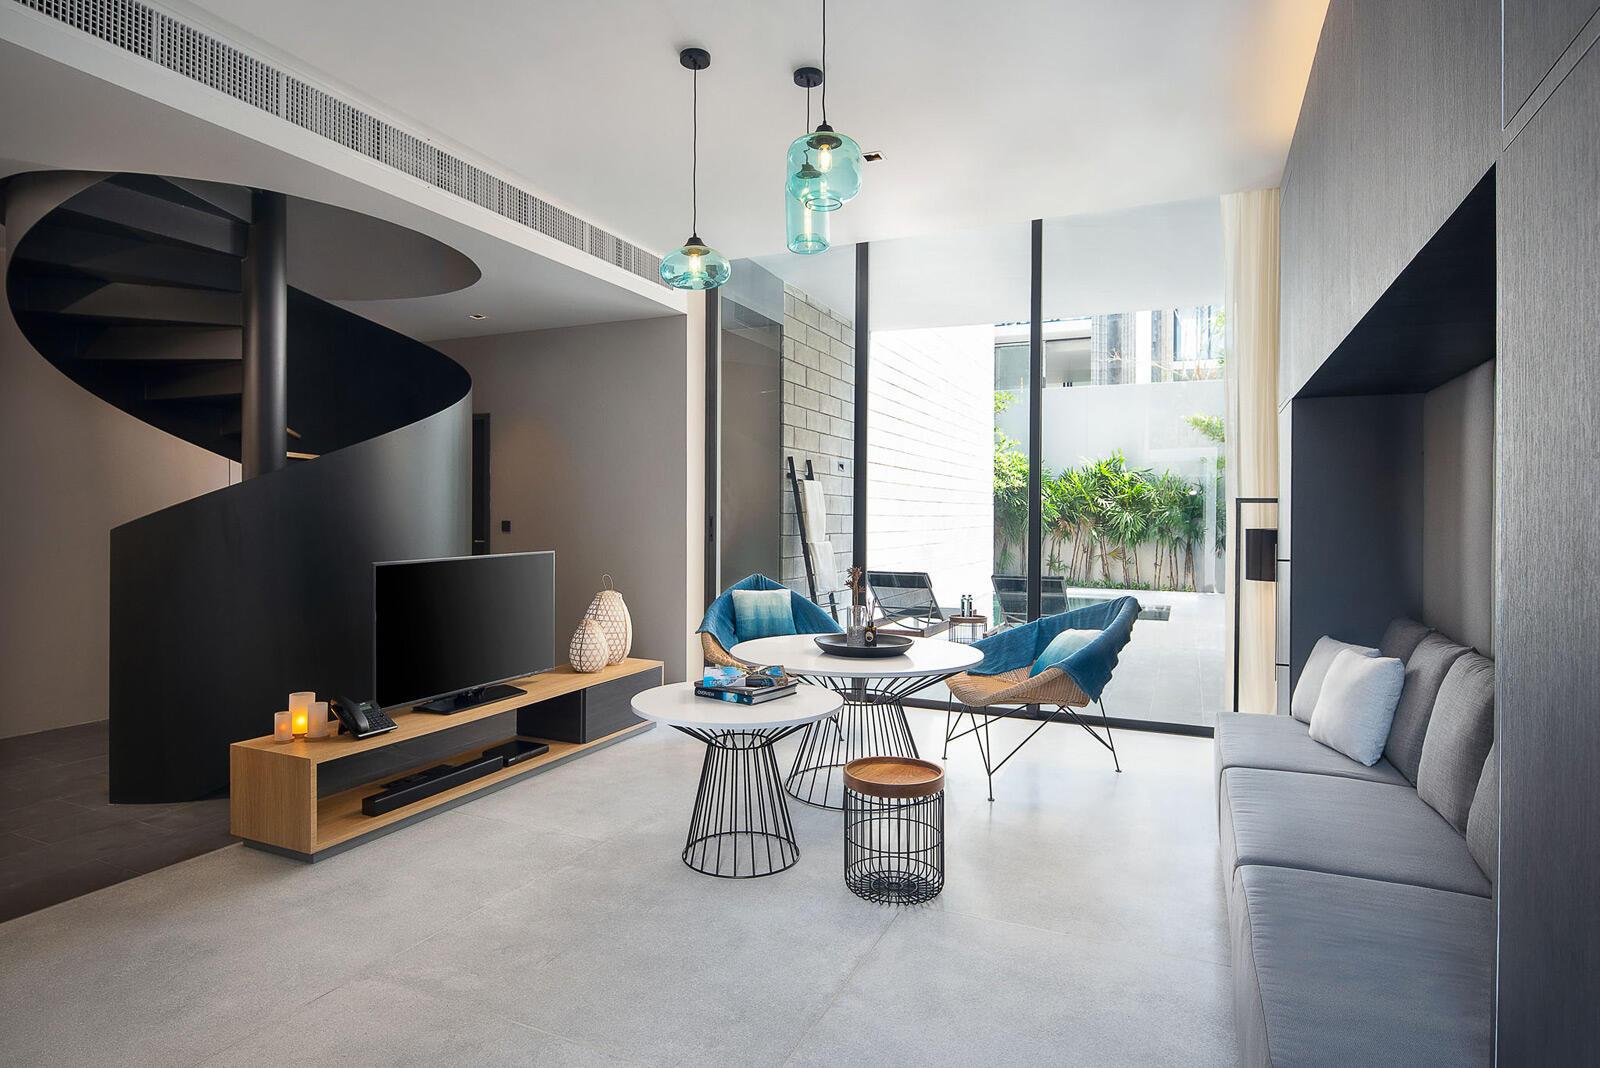 X2 Pattaya Oceanphere 2 Bedroom Villa - Spacious Living Room